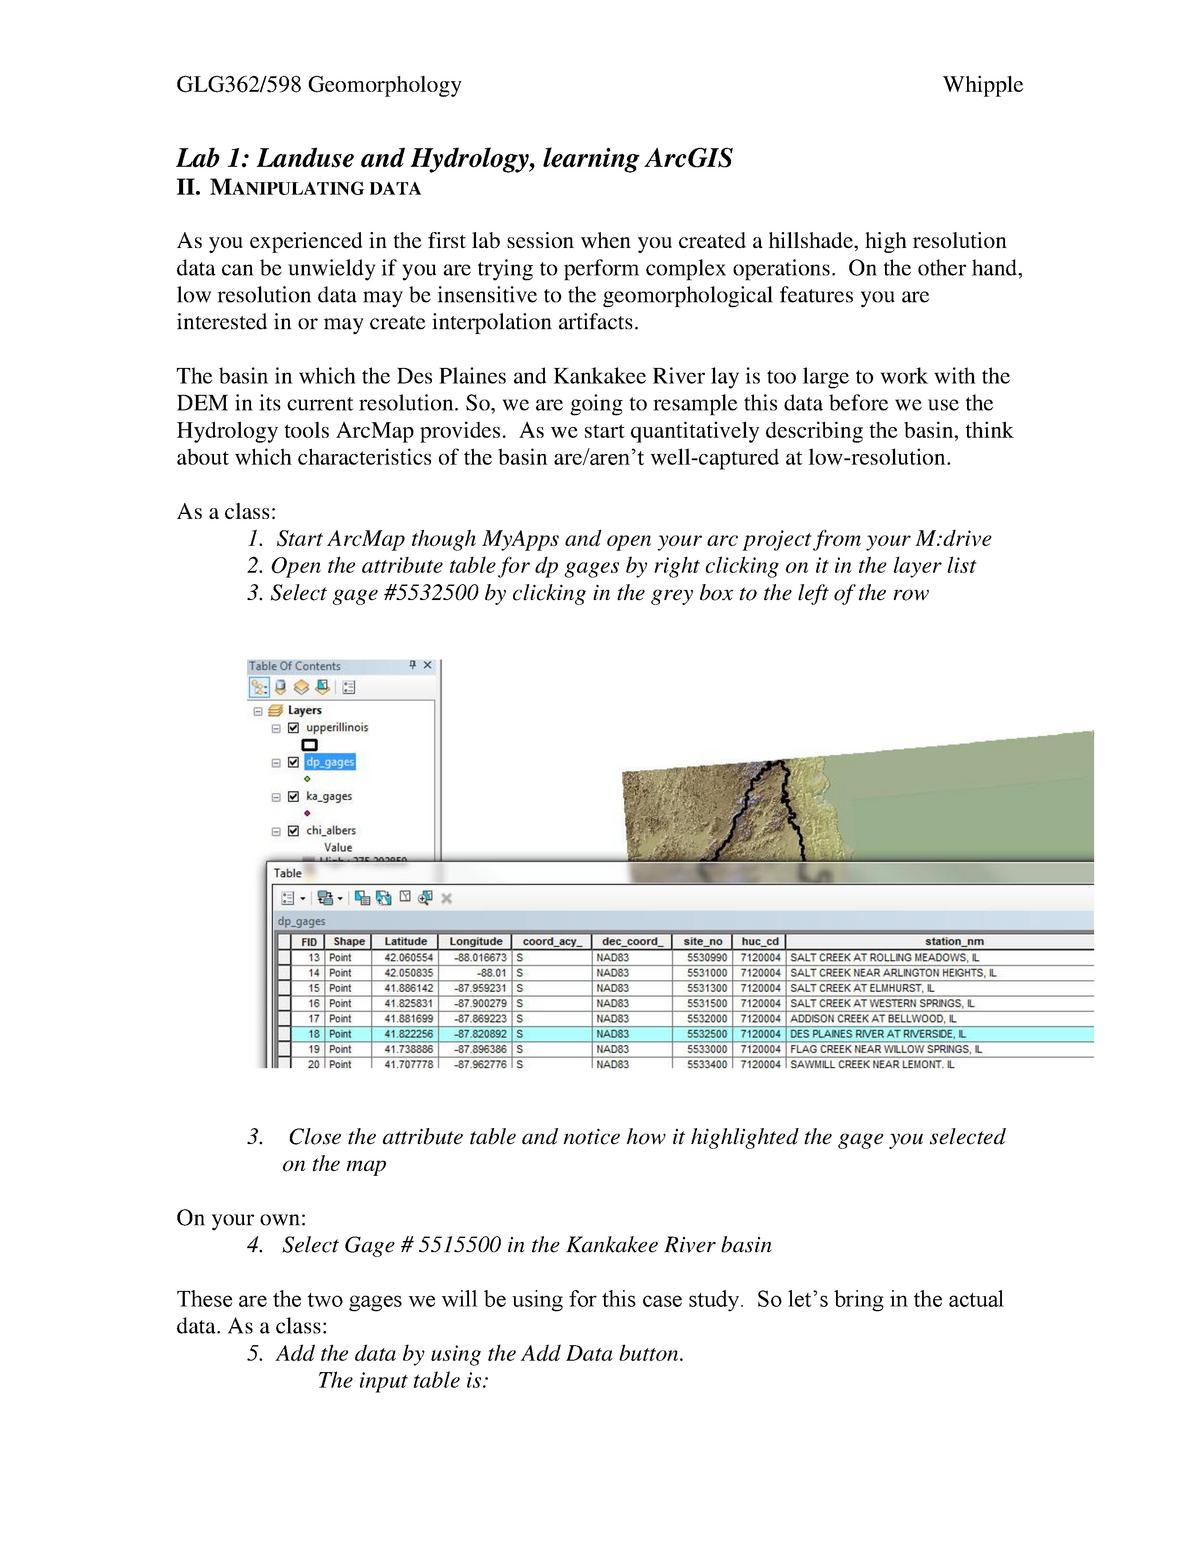 Practical - Lab 1b - GLG 362: Geomorphology - StuDocu